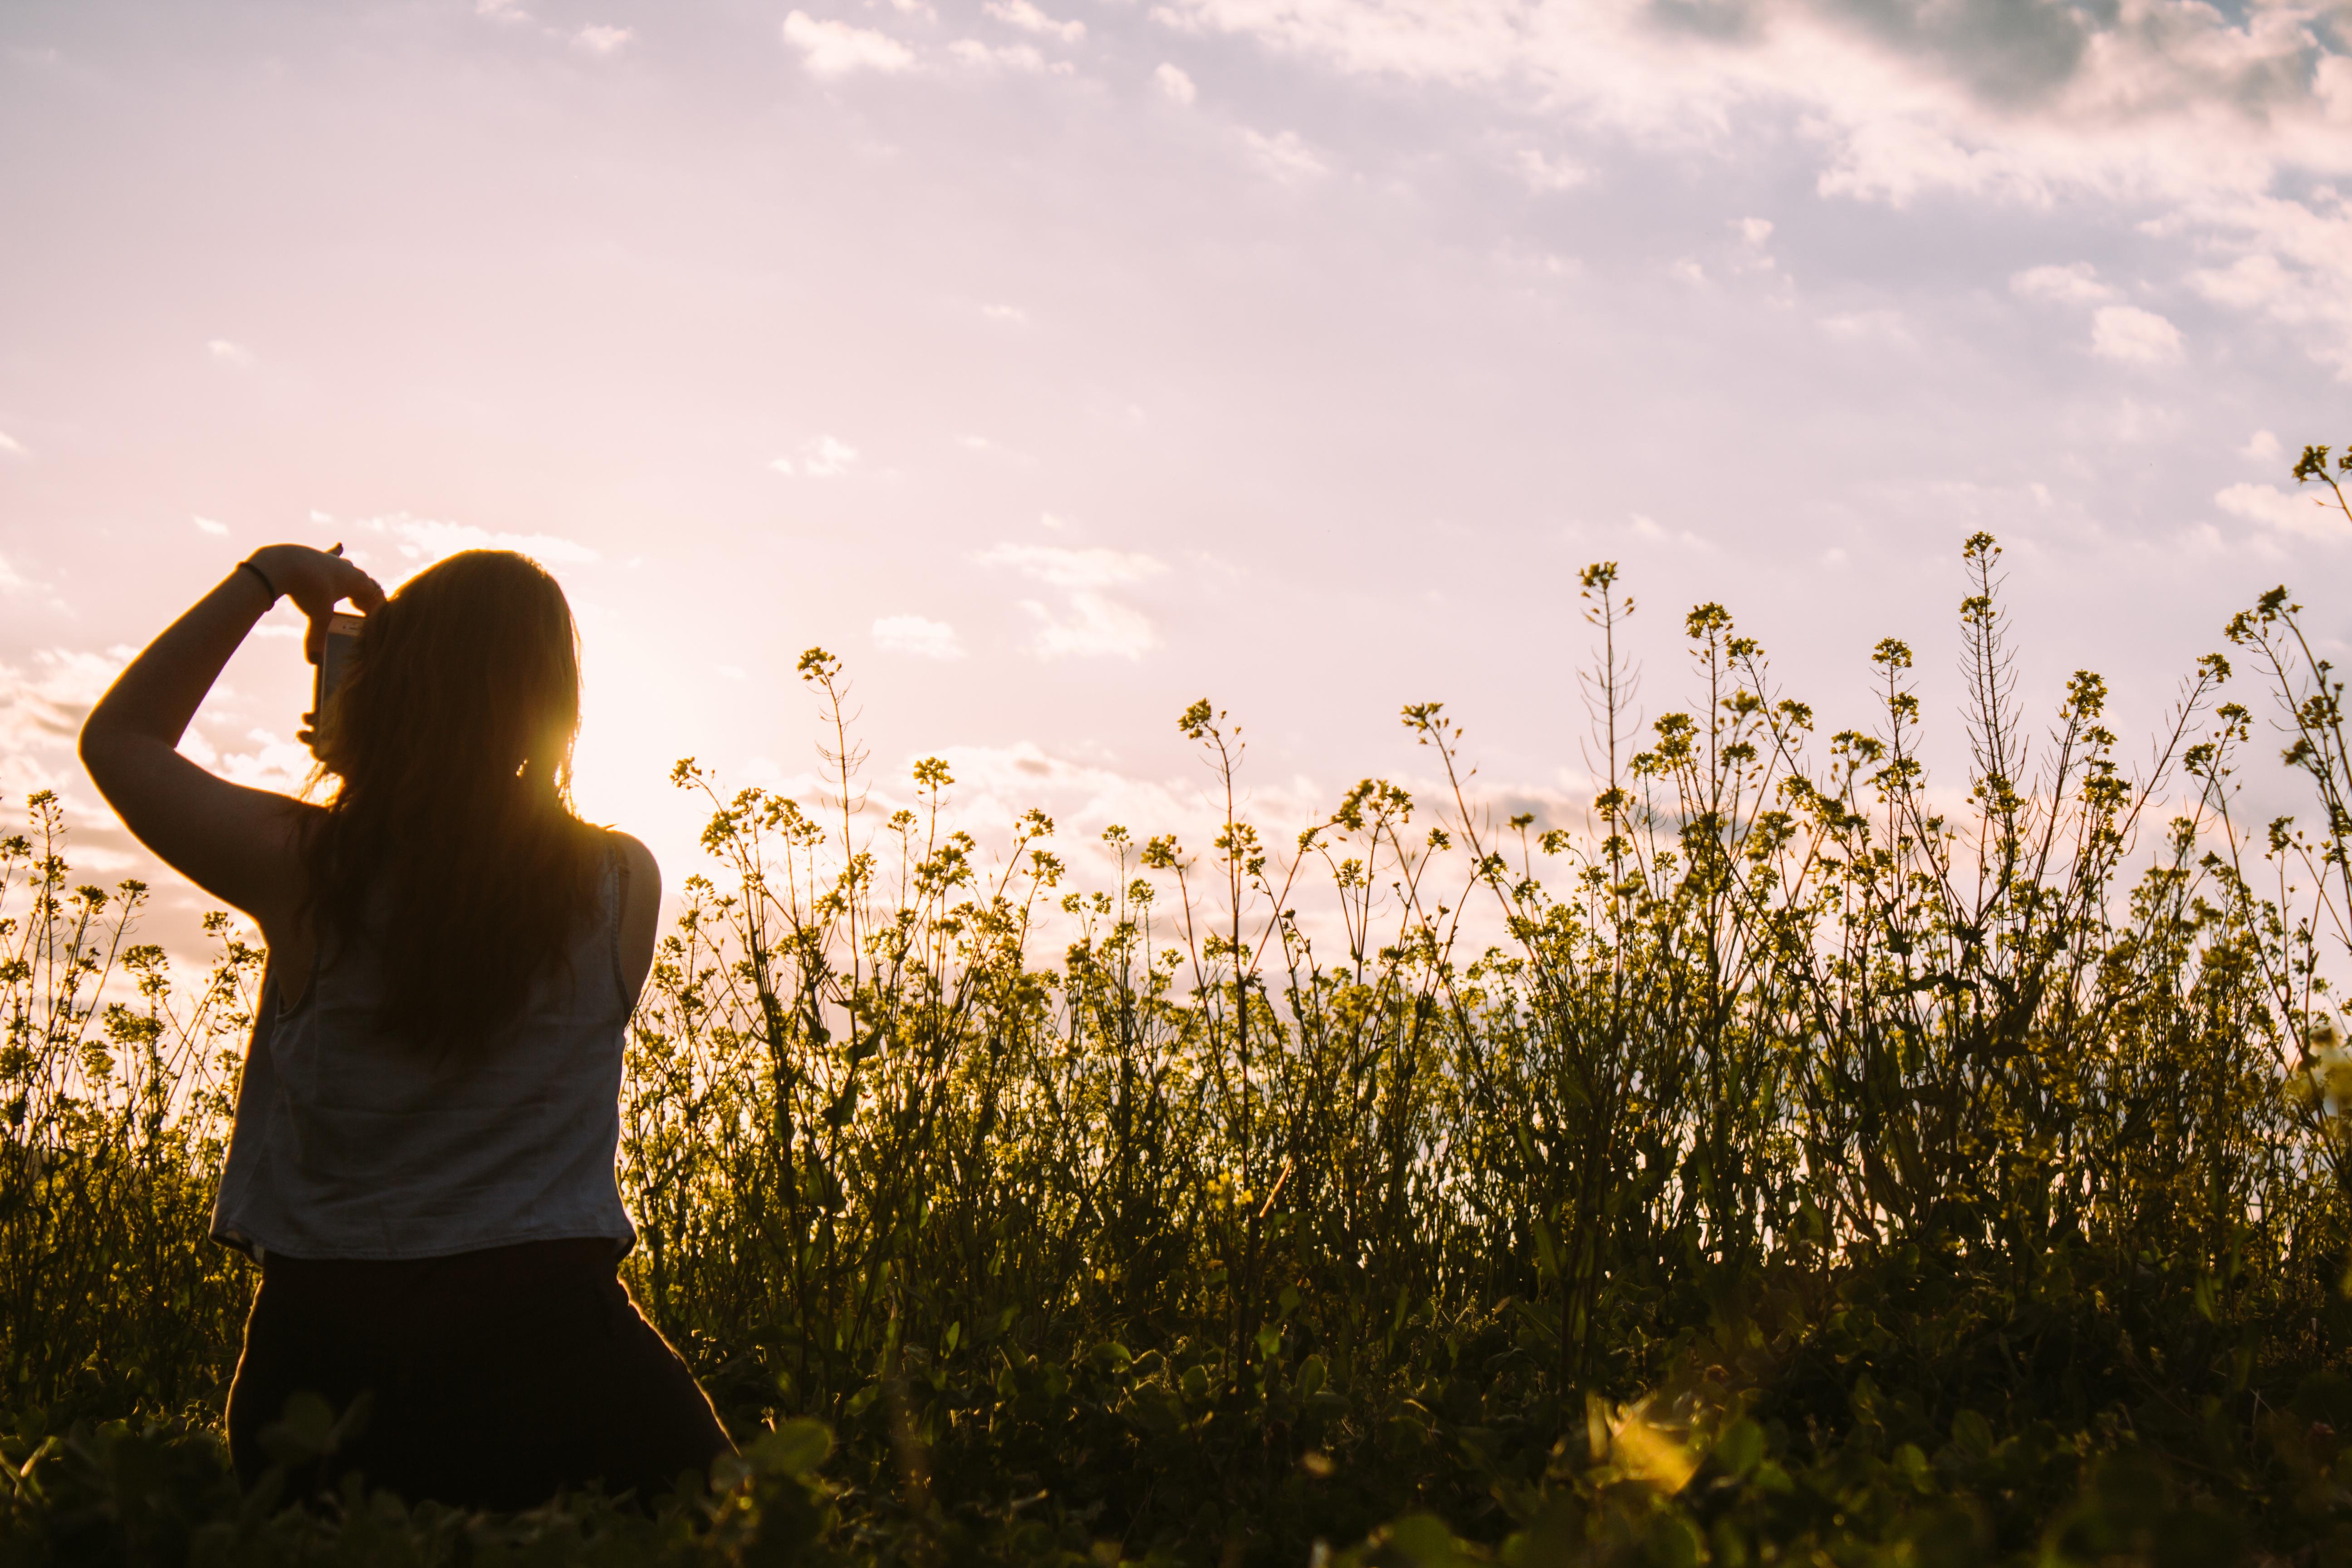 Girl in a field, Field, Flowers, Girl, Mobile, HQ Photo